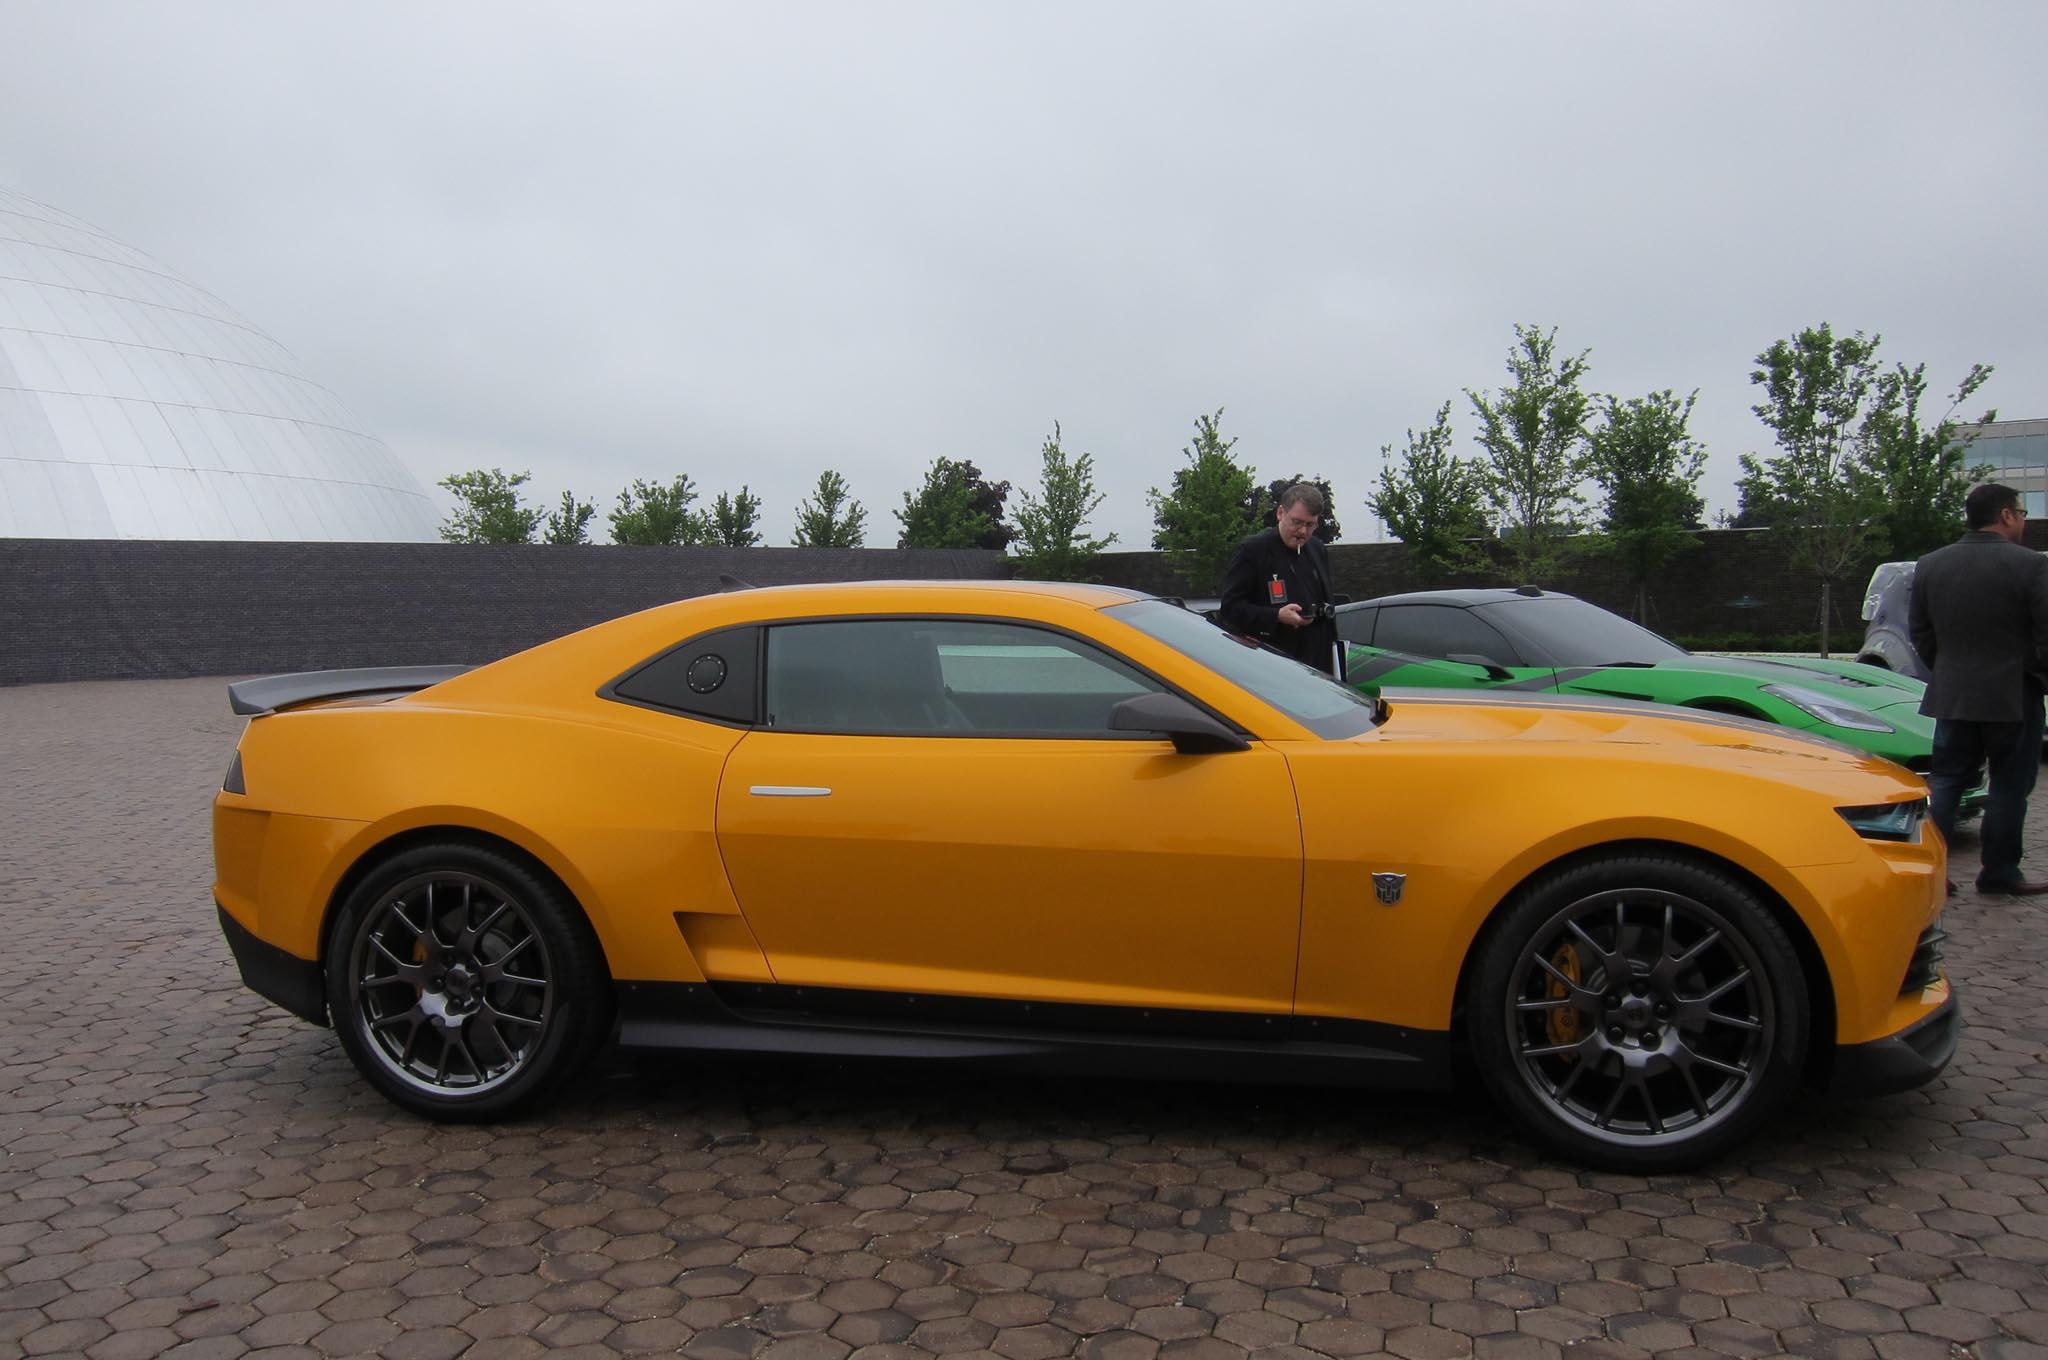 Gm Design Shows Off Transformers 4 Movie Cars Automobile